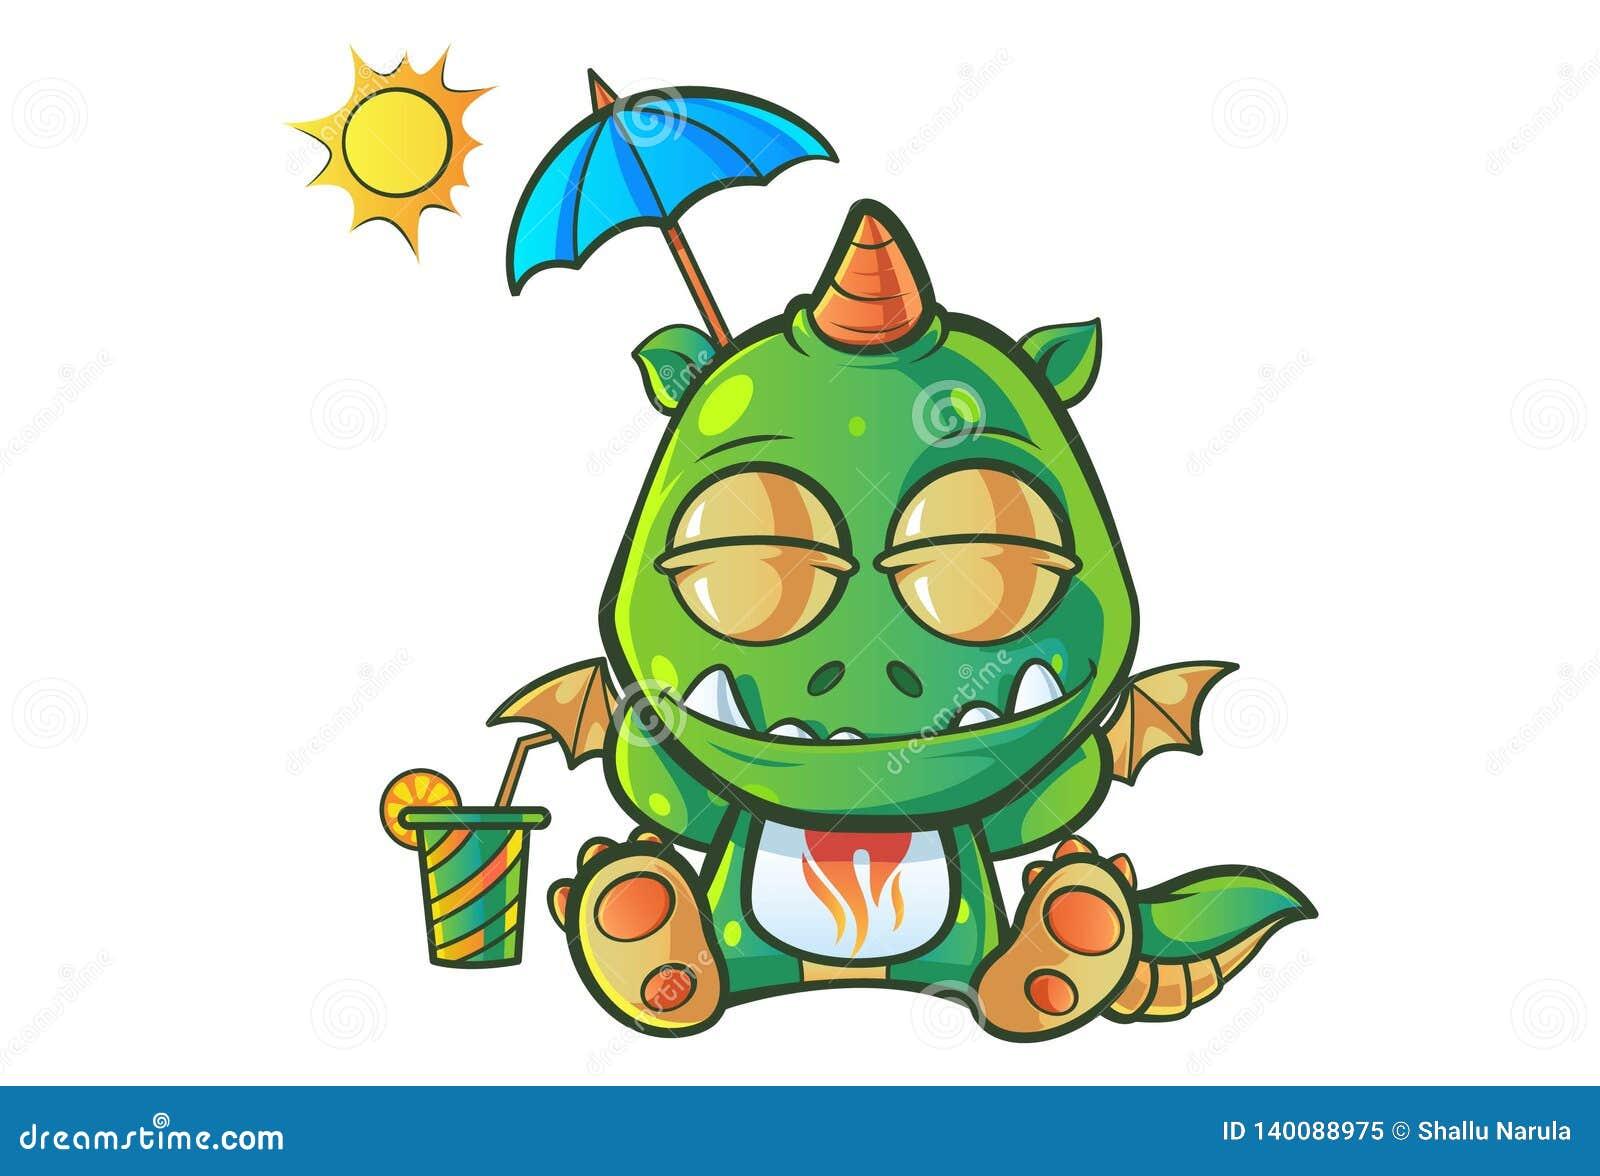 Cartoon Illustration Of Cute Baby Dragon Stock Vector Illustration Of Cartoon Dinosaur 140088975